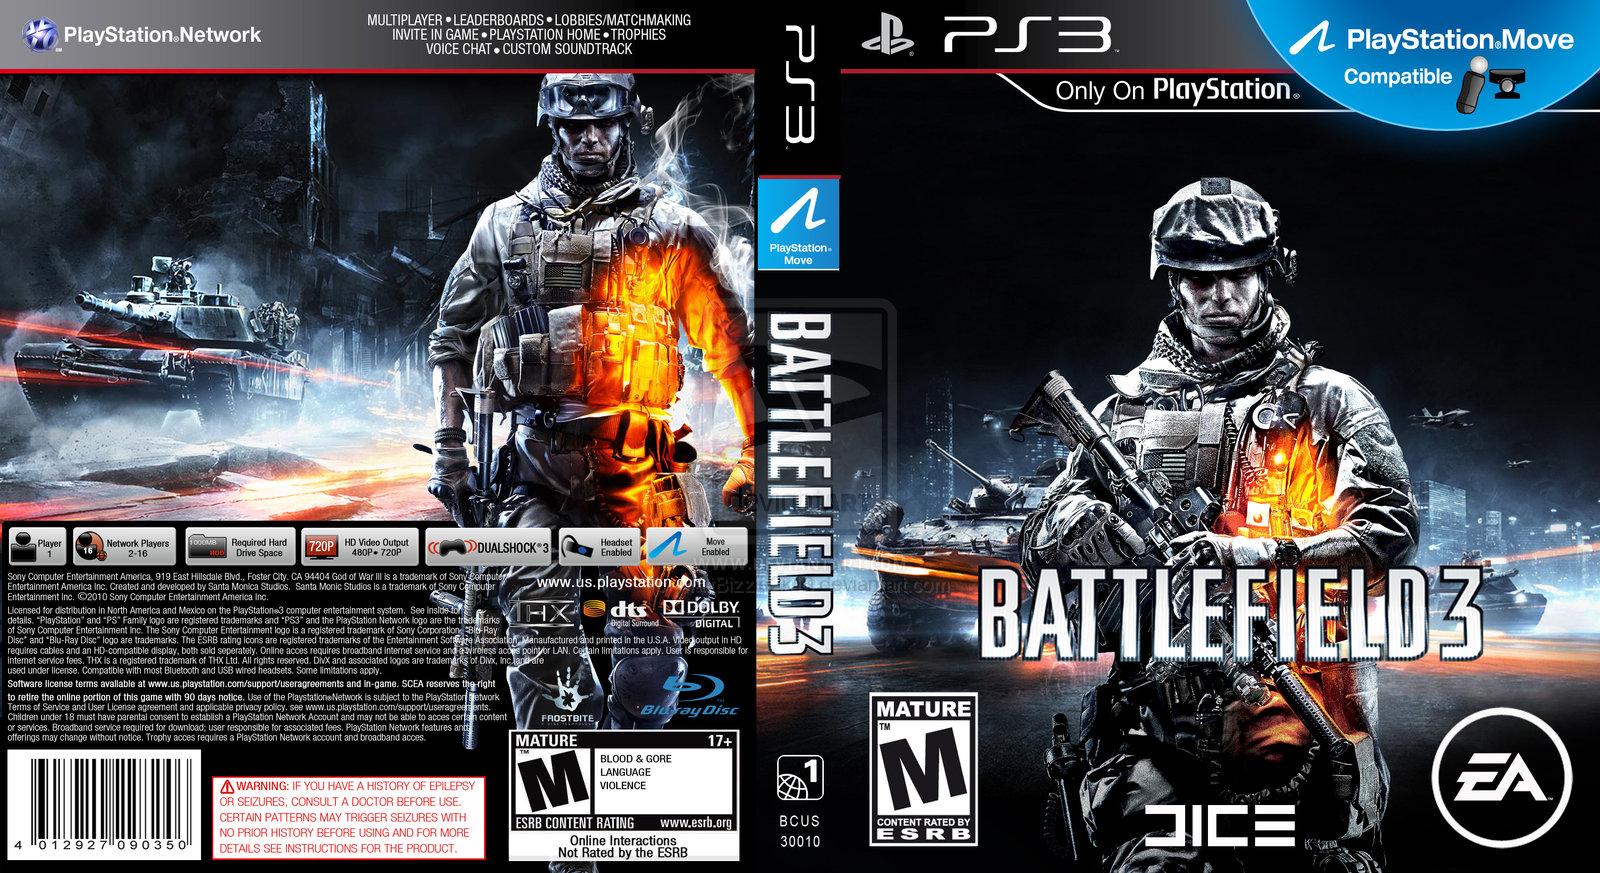 Battlefield 3 Cover Ps3 | www.pixshark.com - Images ...